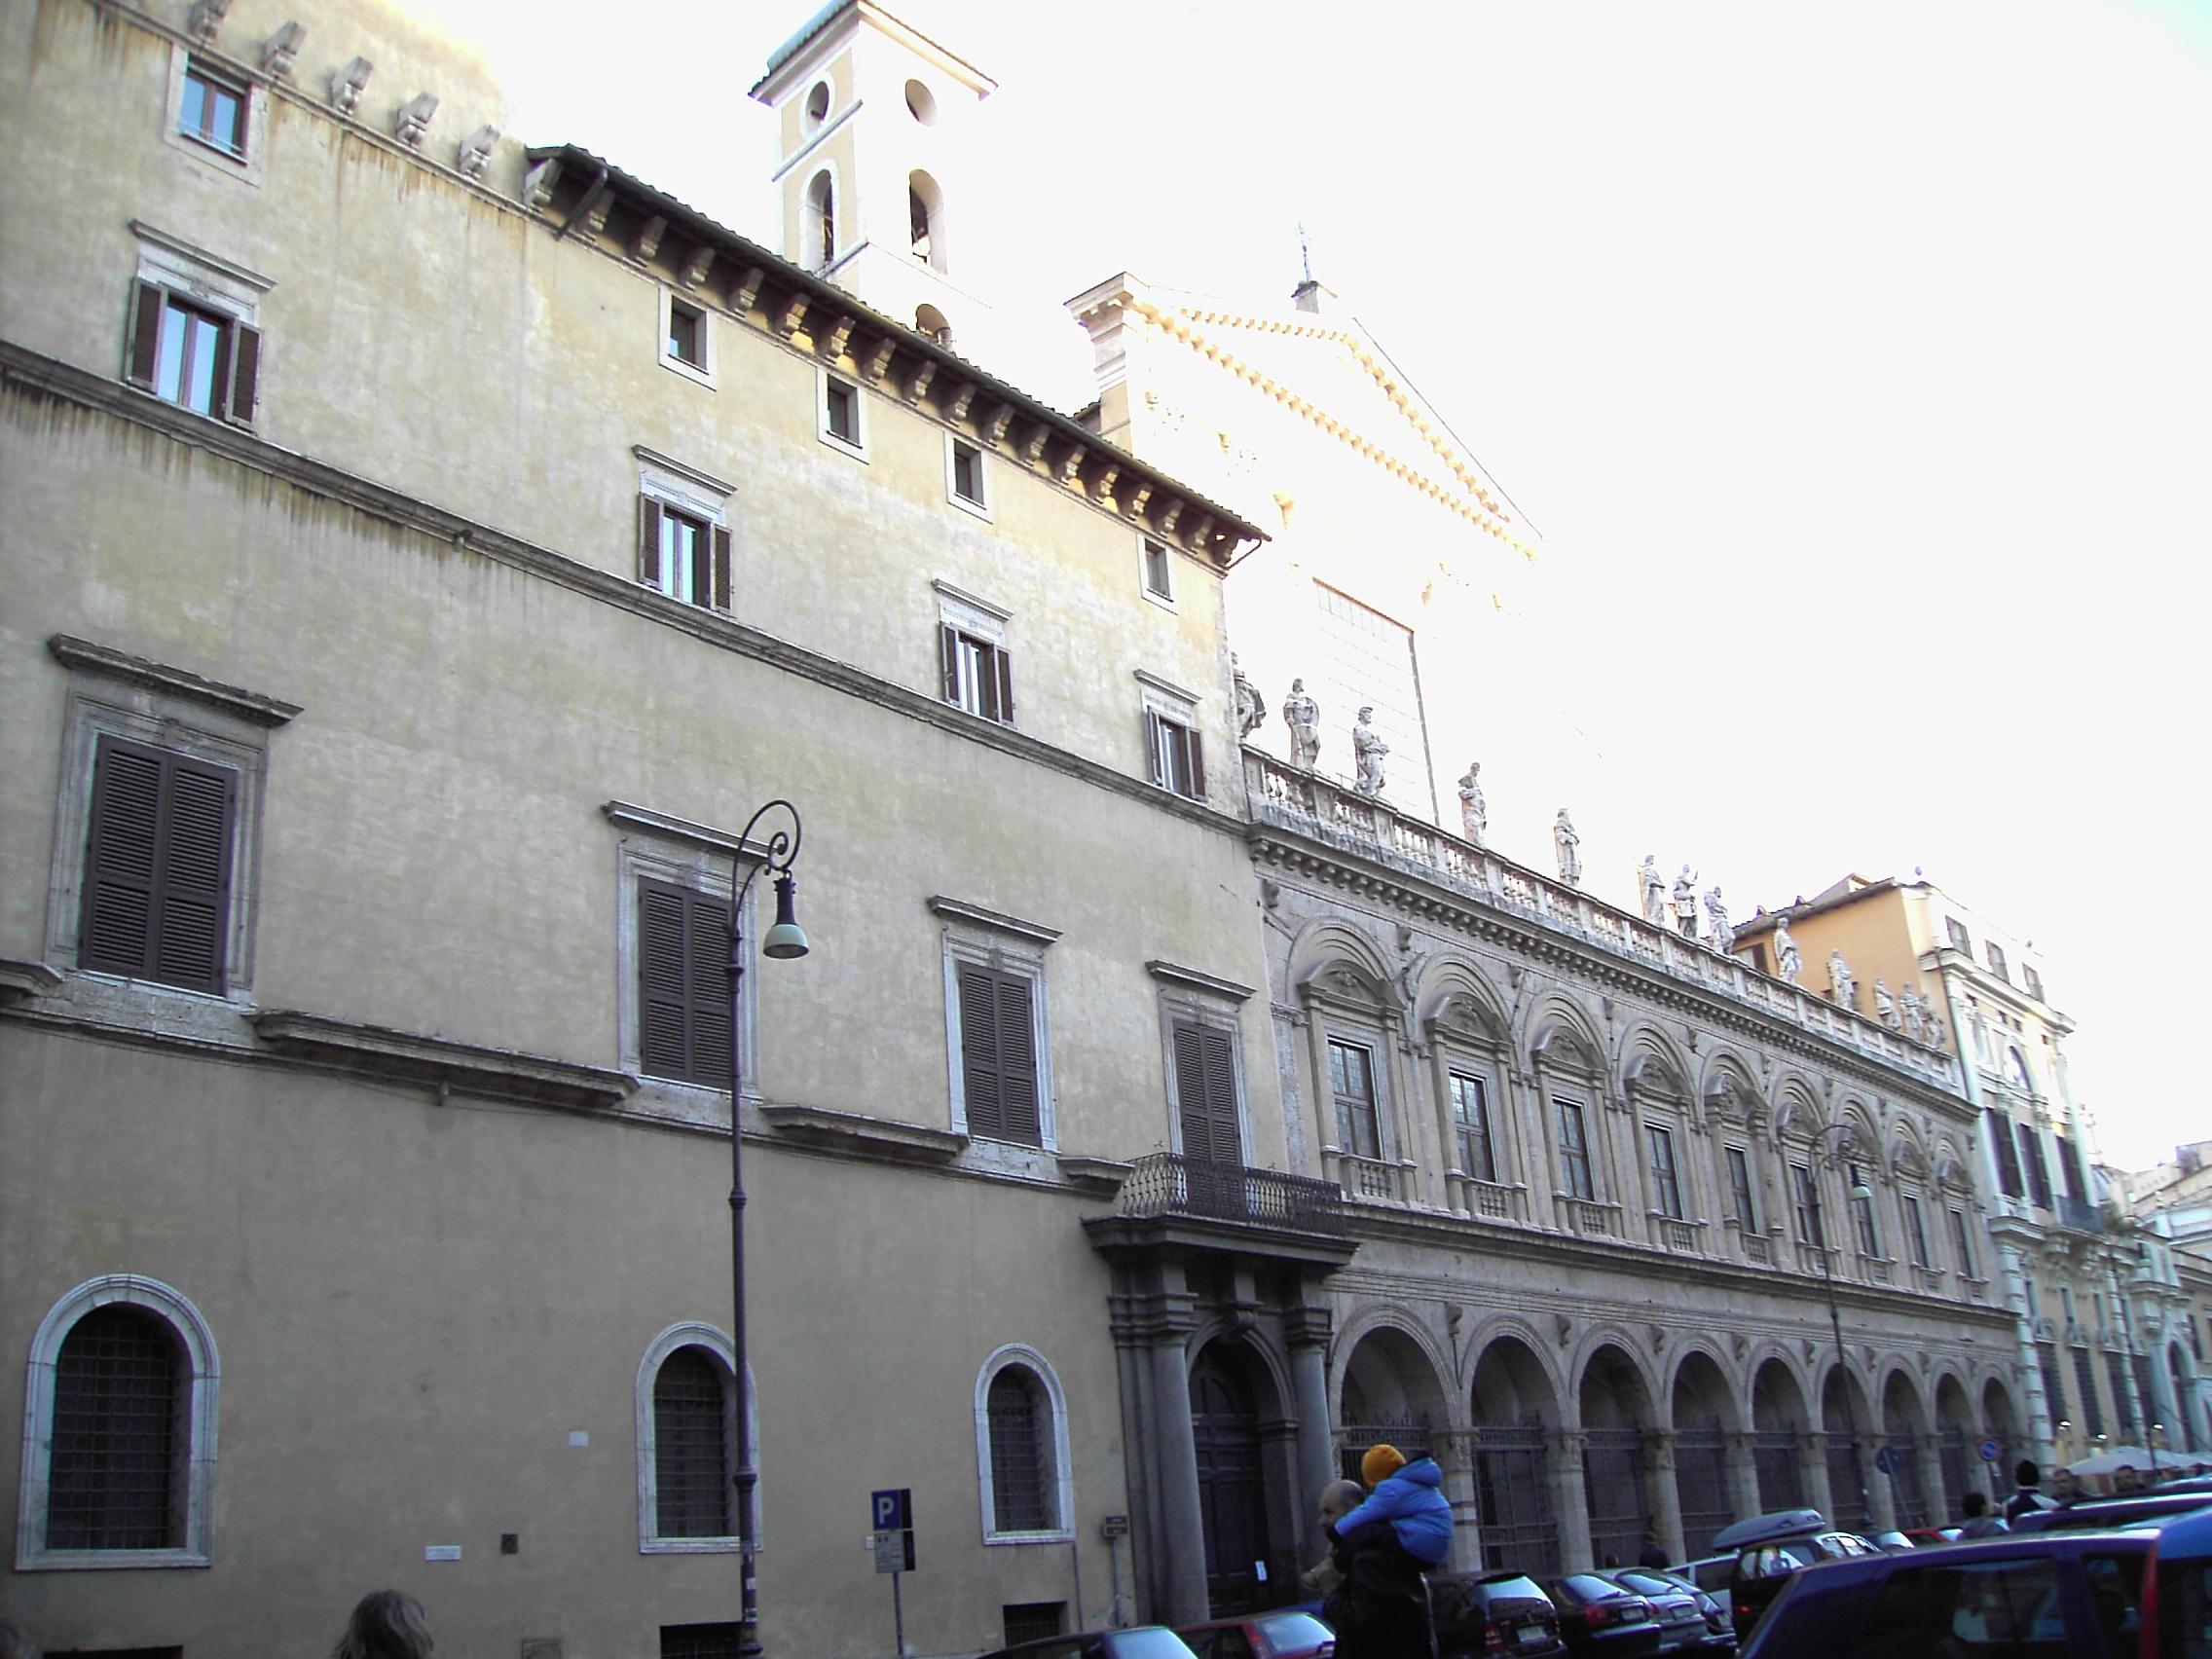 File Santi apostoli palazzo colonna 03 JPG